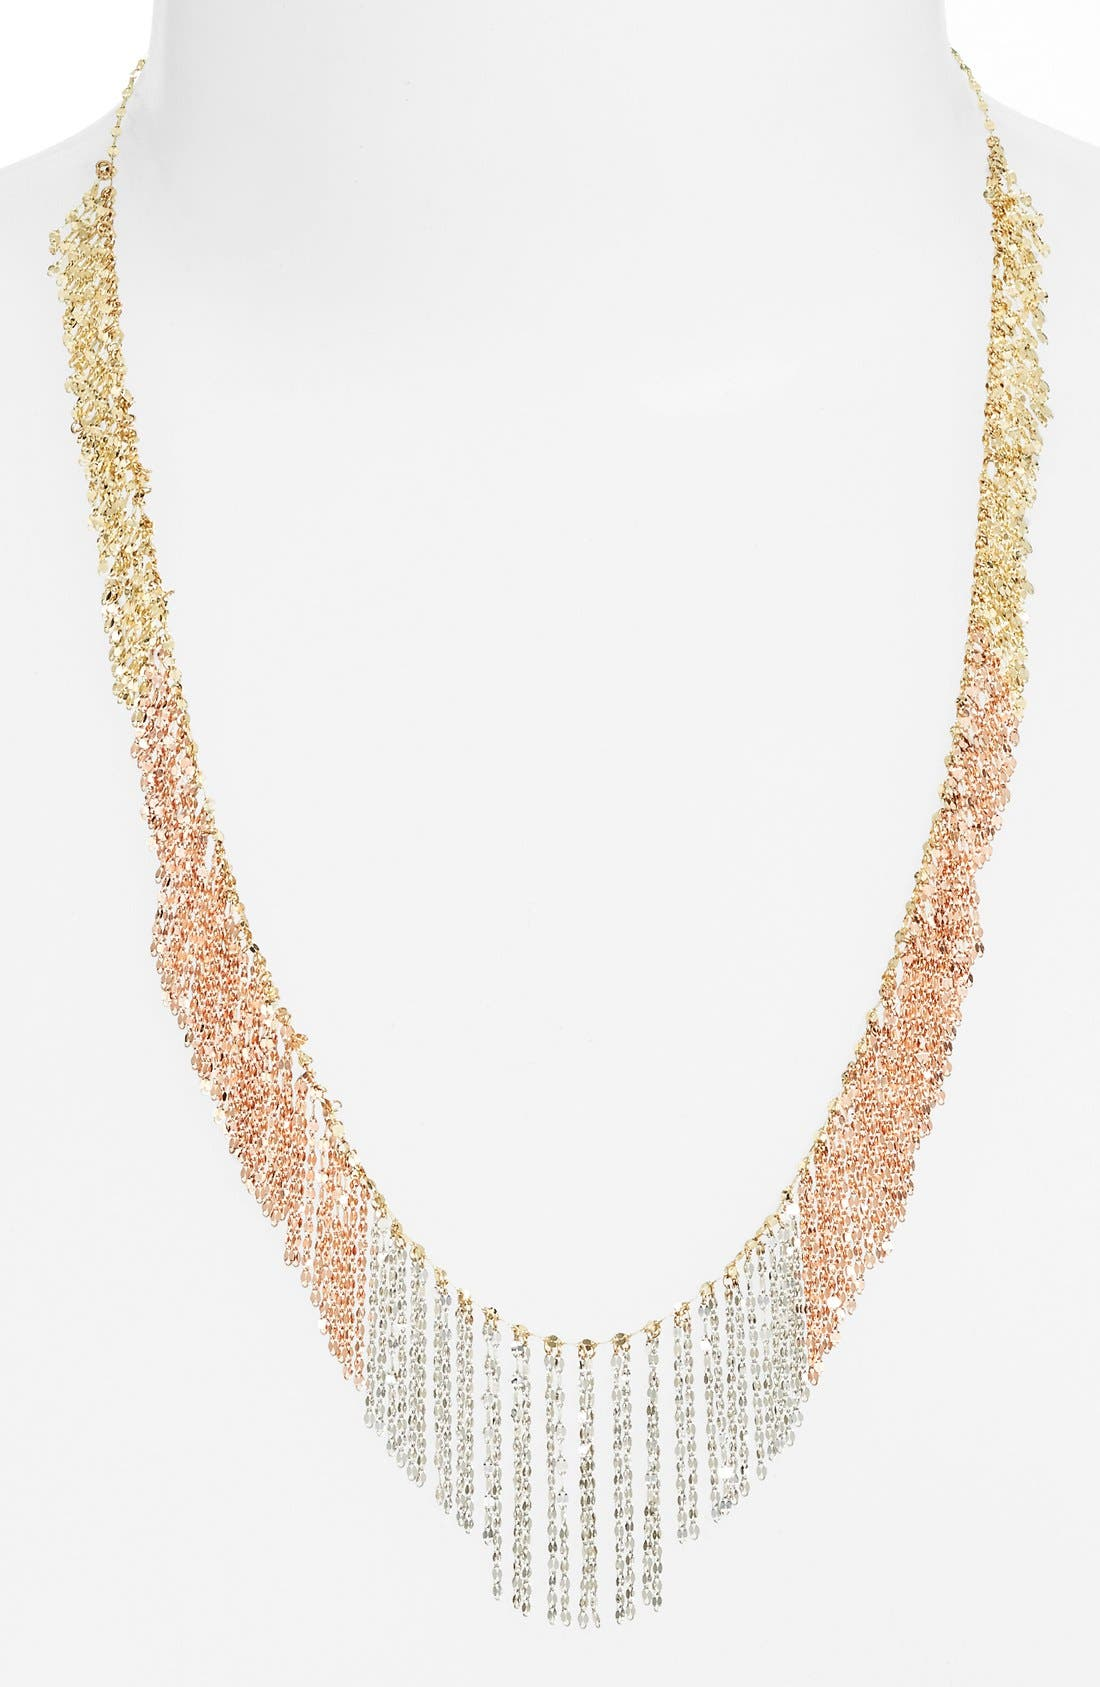 Lana Jewelry 'Nude' Tri-Color Fringe Necklace